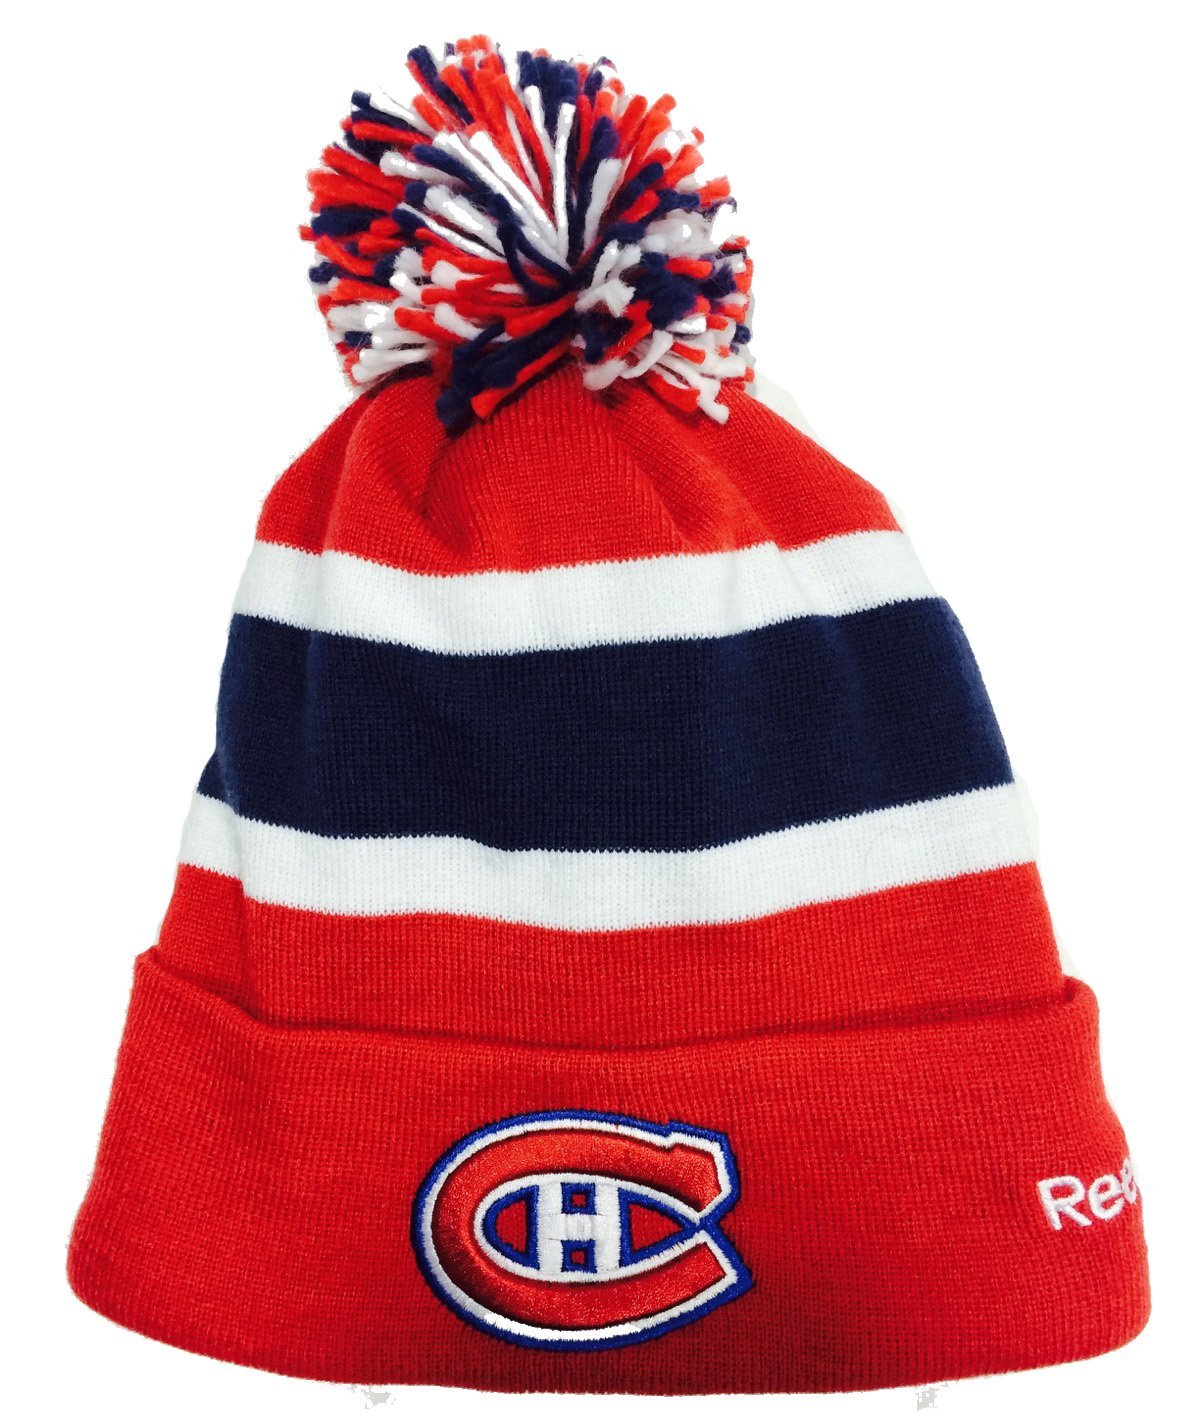 456fd57118a Reebok Montreal Canadiens - Winter Hat